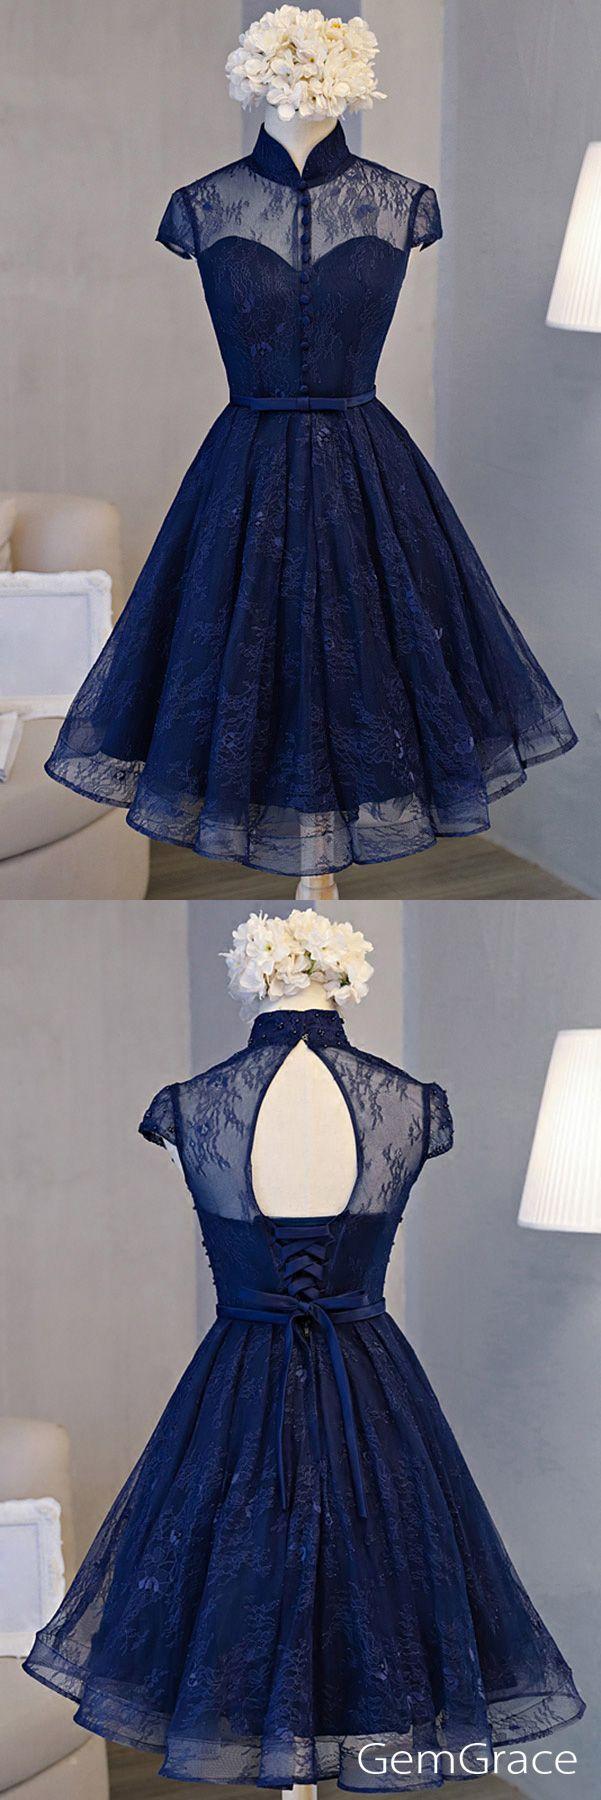 Navy blue special high neck party prom dress dress pinterest